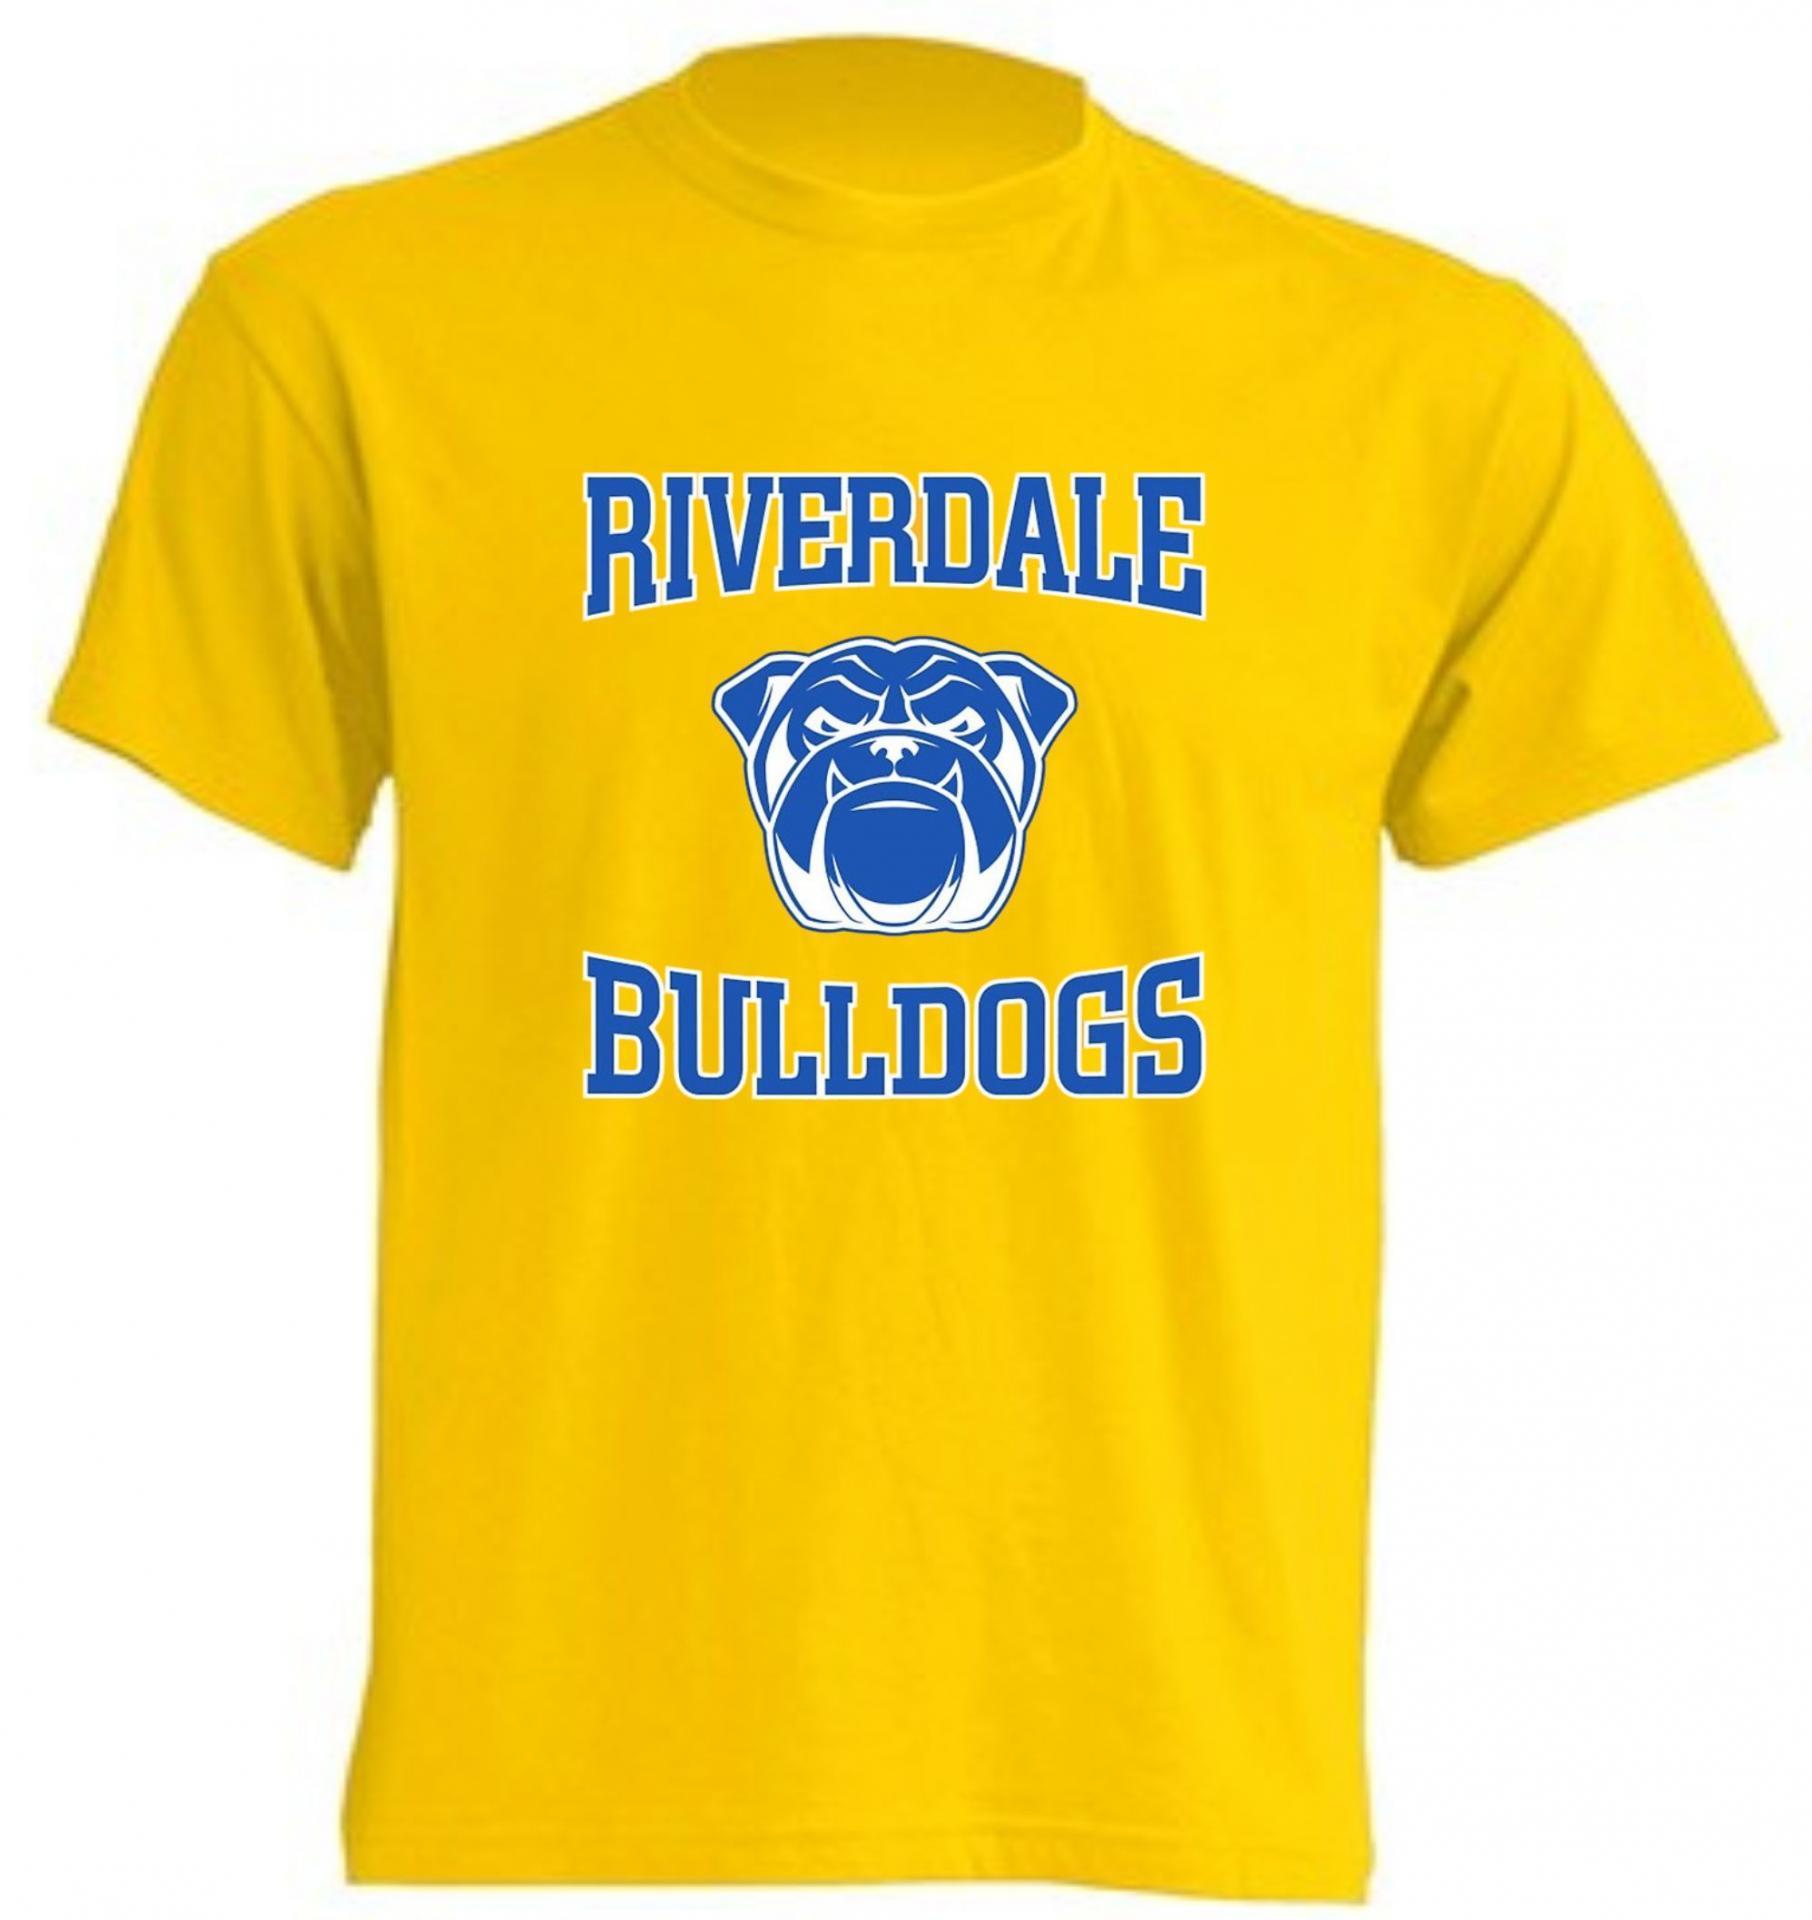 Camiseta Riverdale Bulldogs